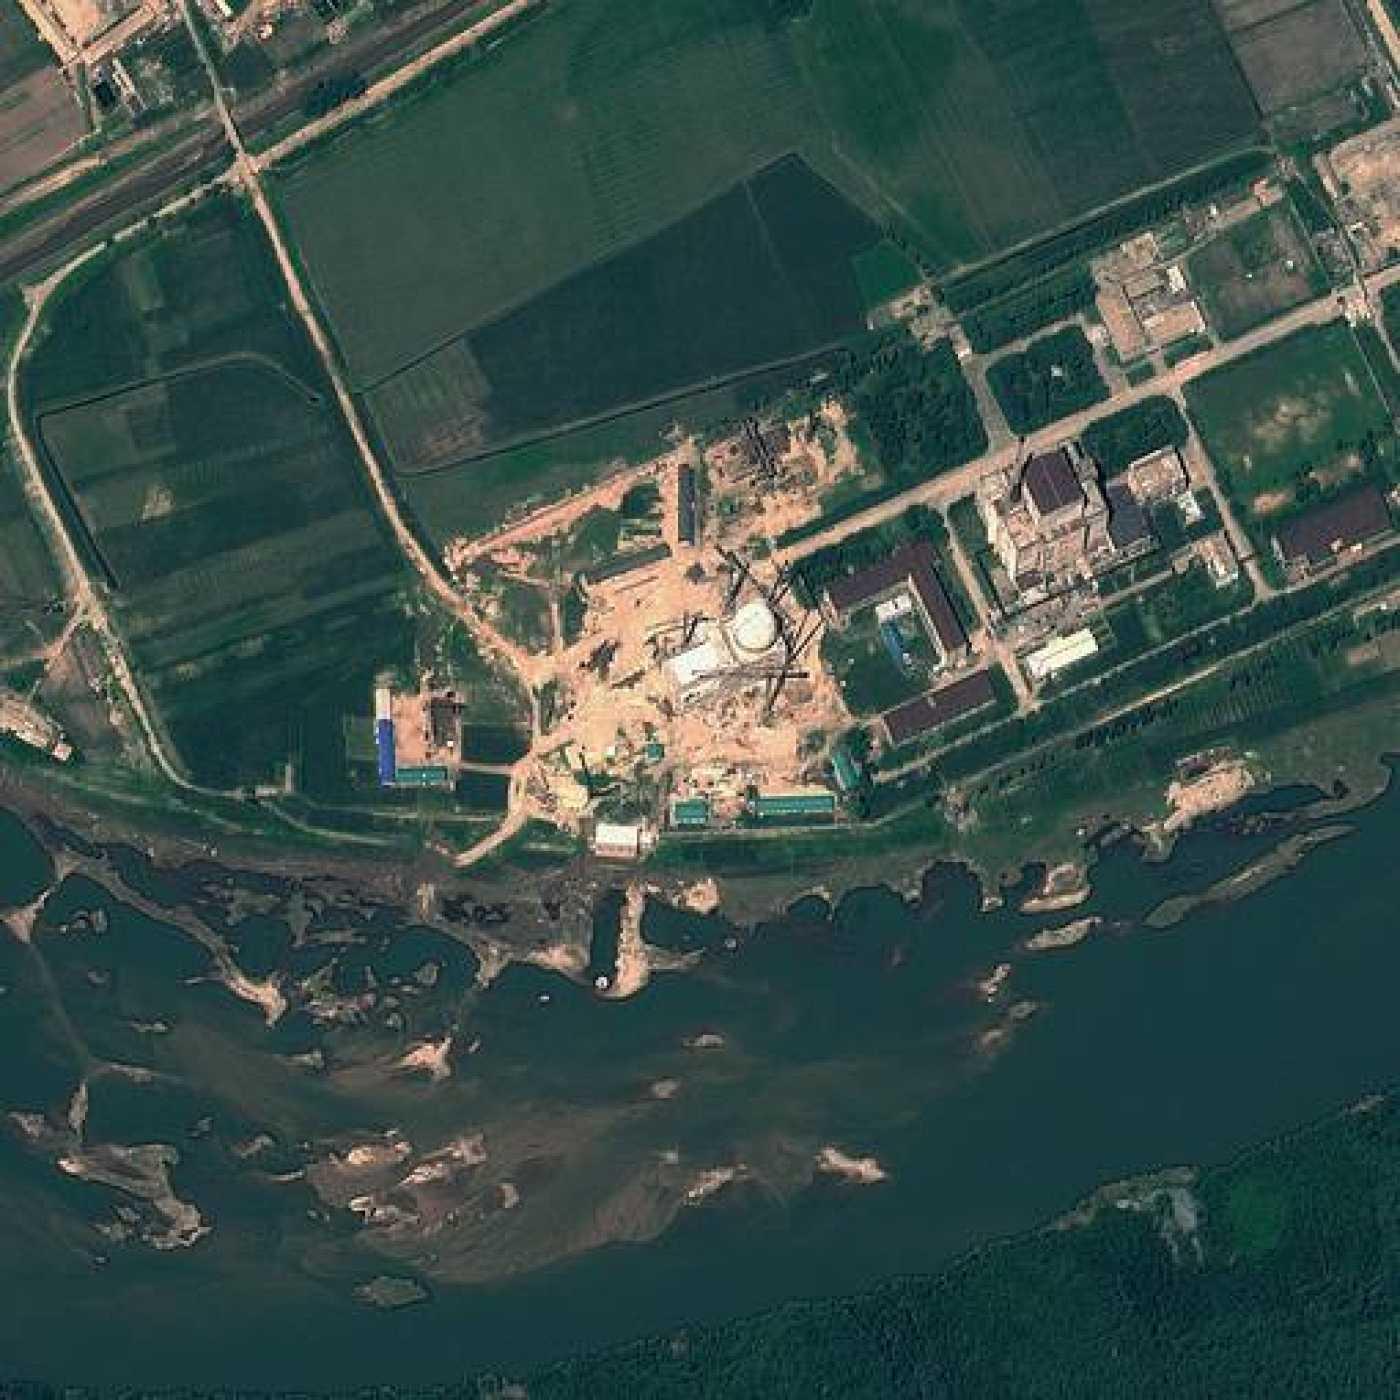 Imagen de satélite de agosto de 2012 de la central nuclear de Yongbyon